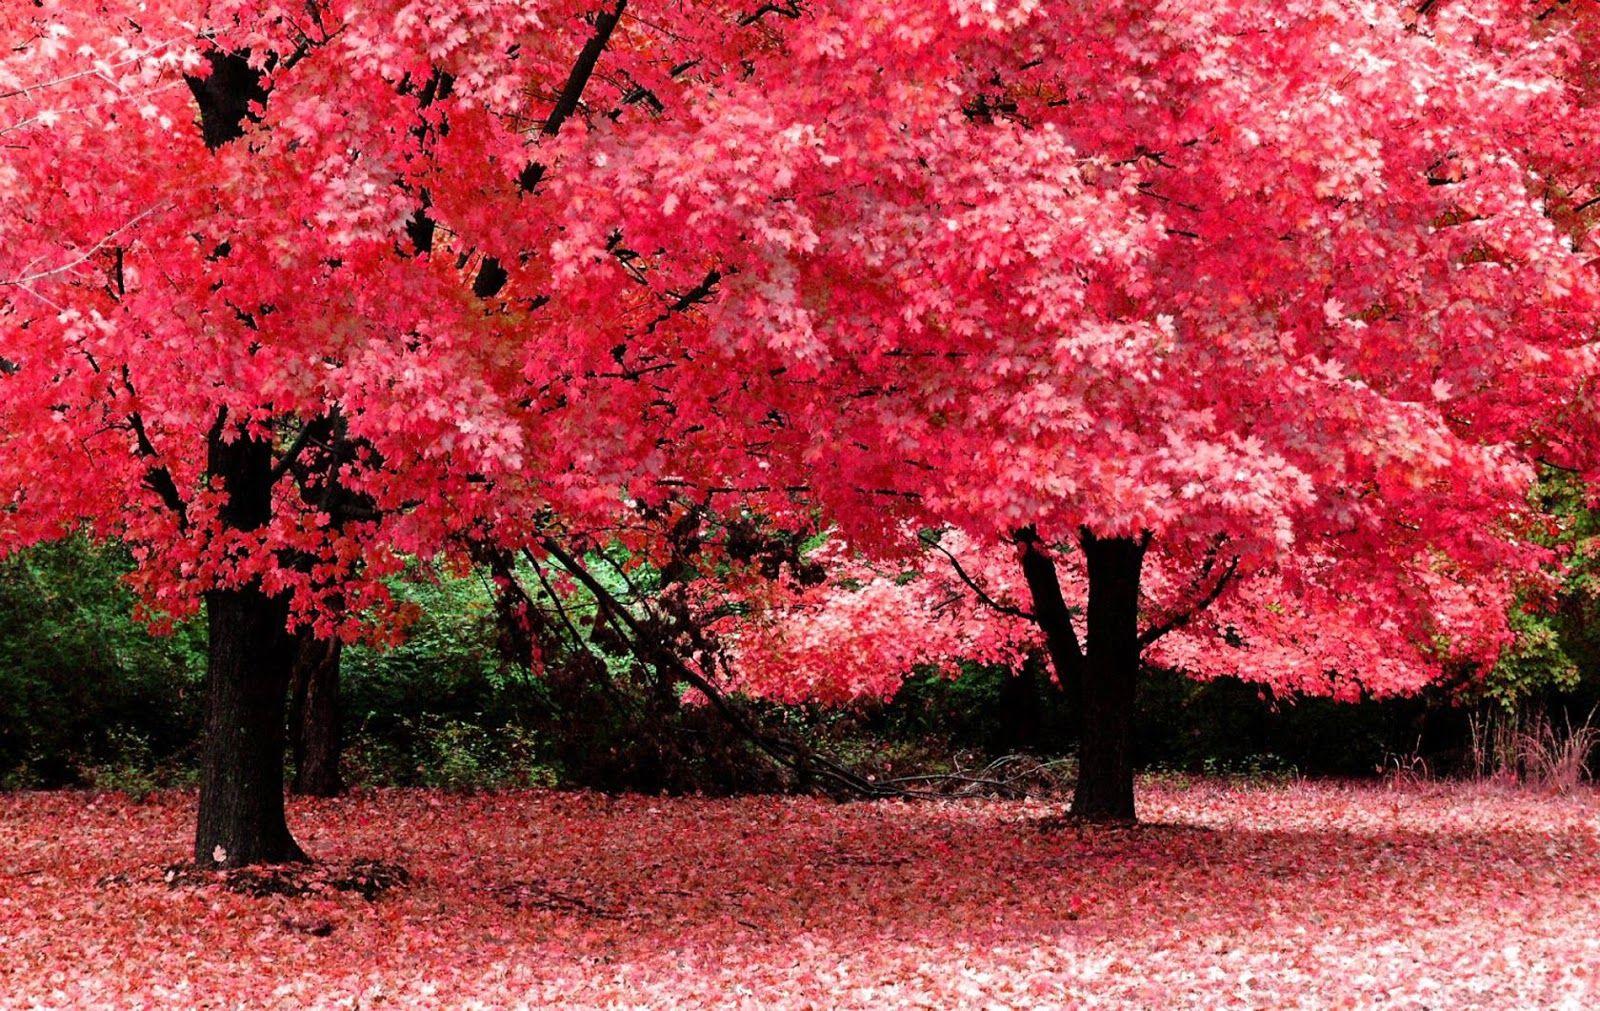 Free Nature Spring Wallpaper Computer Wallpaper Free Wallpaper Downloads Beautiful Tree Pink Trees Nature